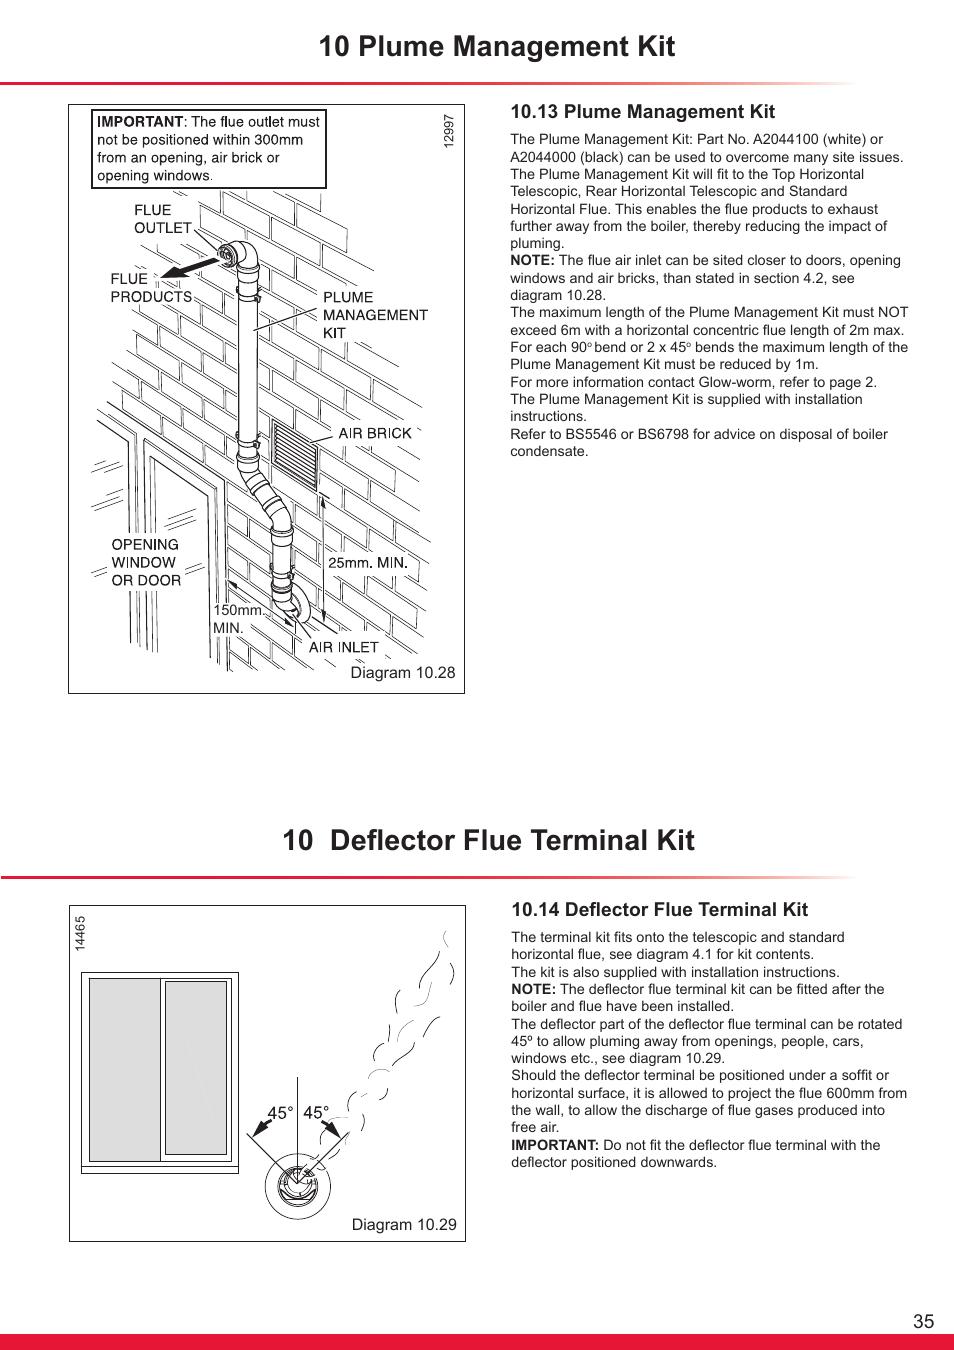 10 plume management kit, 10 deflector flue terminal kit, 13 plume ...